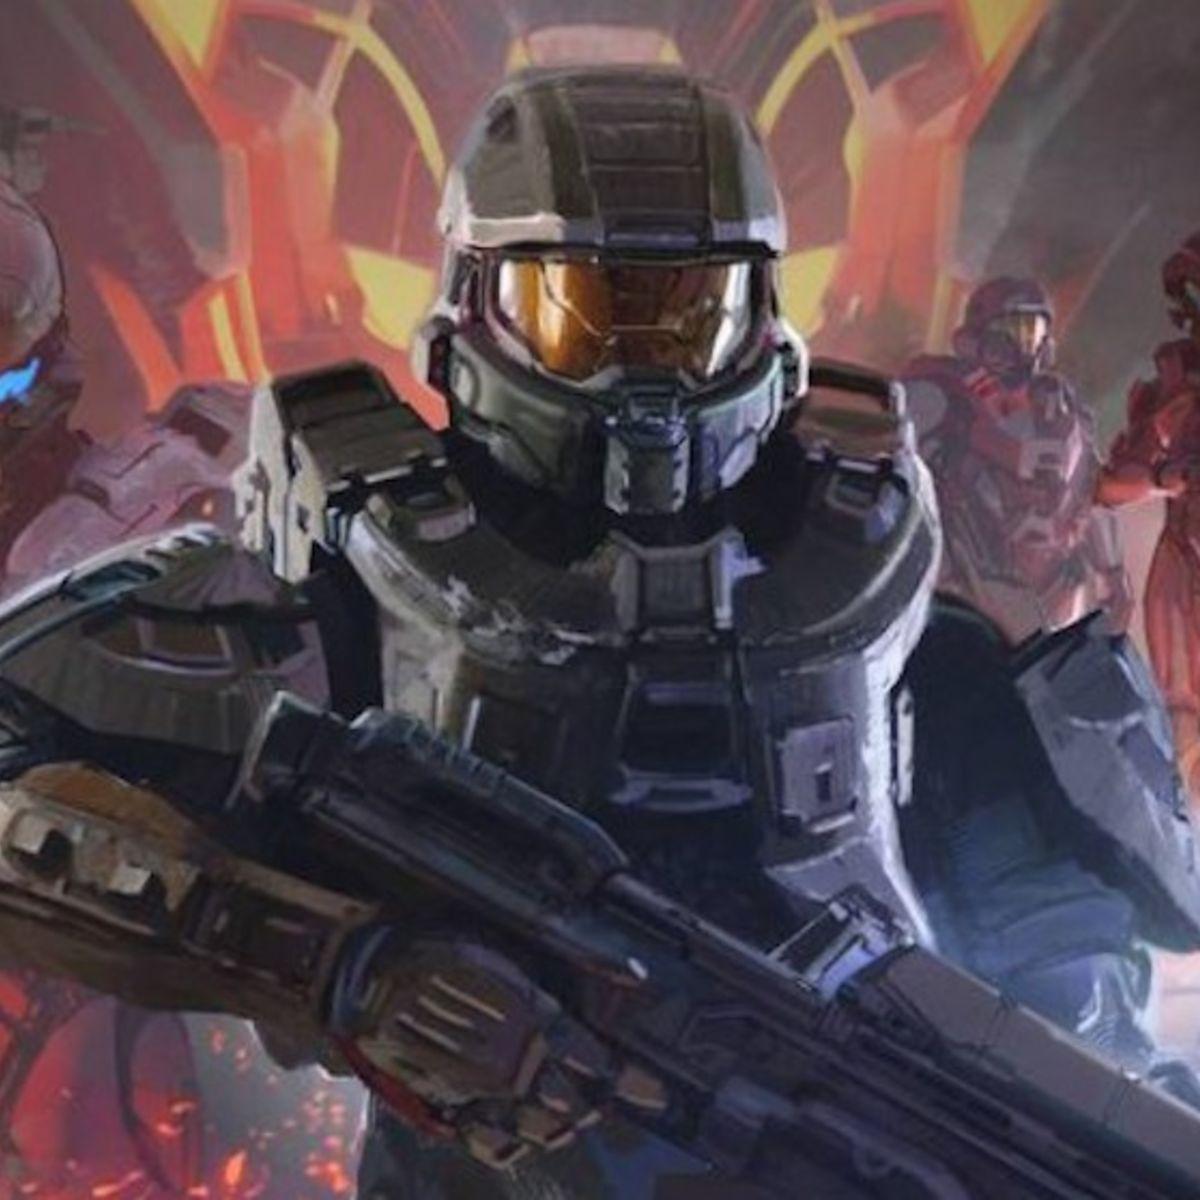 Halo_5_Guardians_Concept_Art_Illustration-680x972-1.jpeg